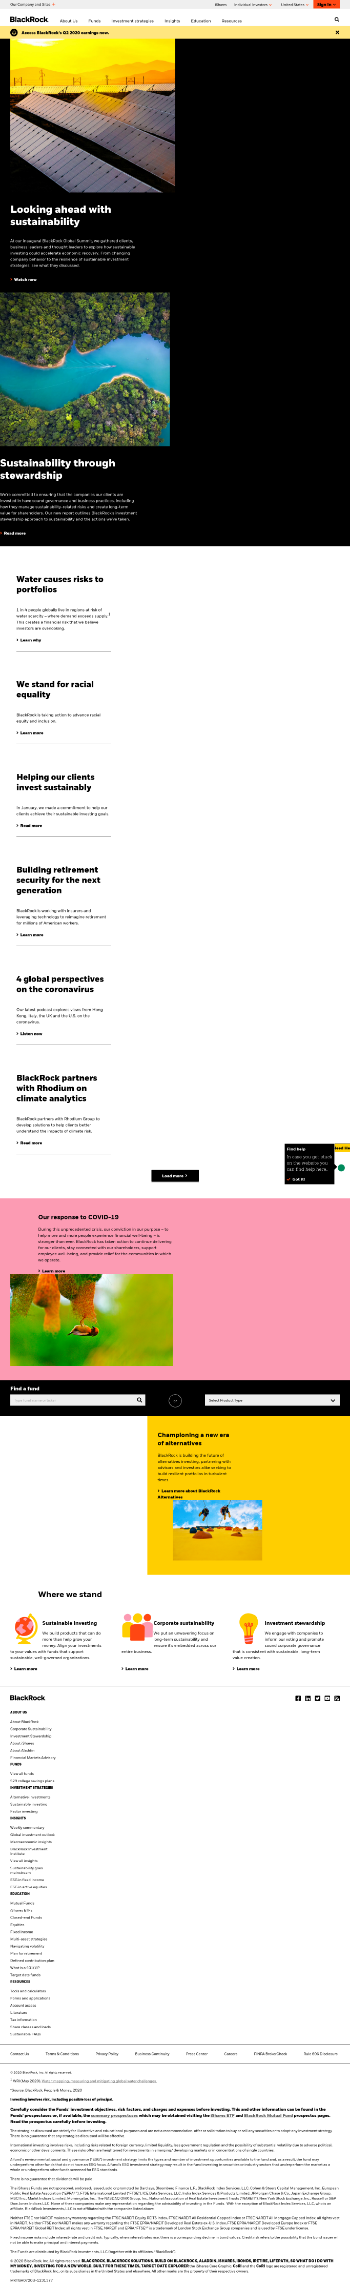 BlackRock Enhanced Capital and Income Fund, Inc. Website Screenshot